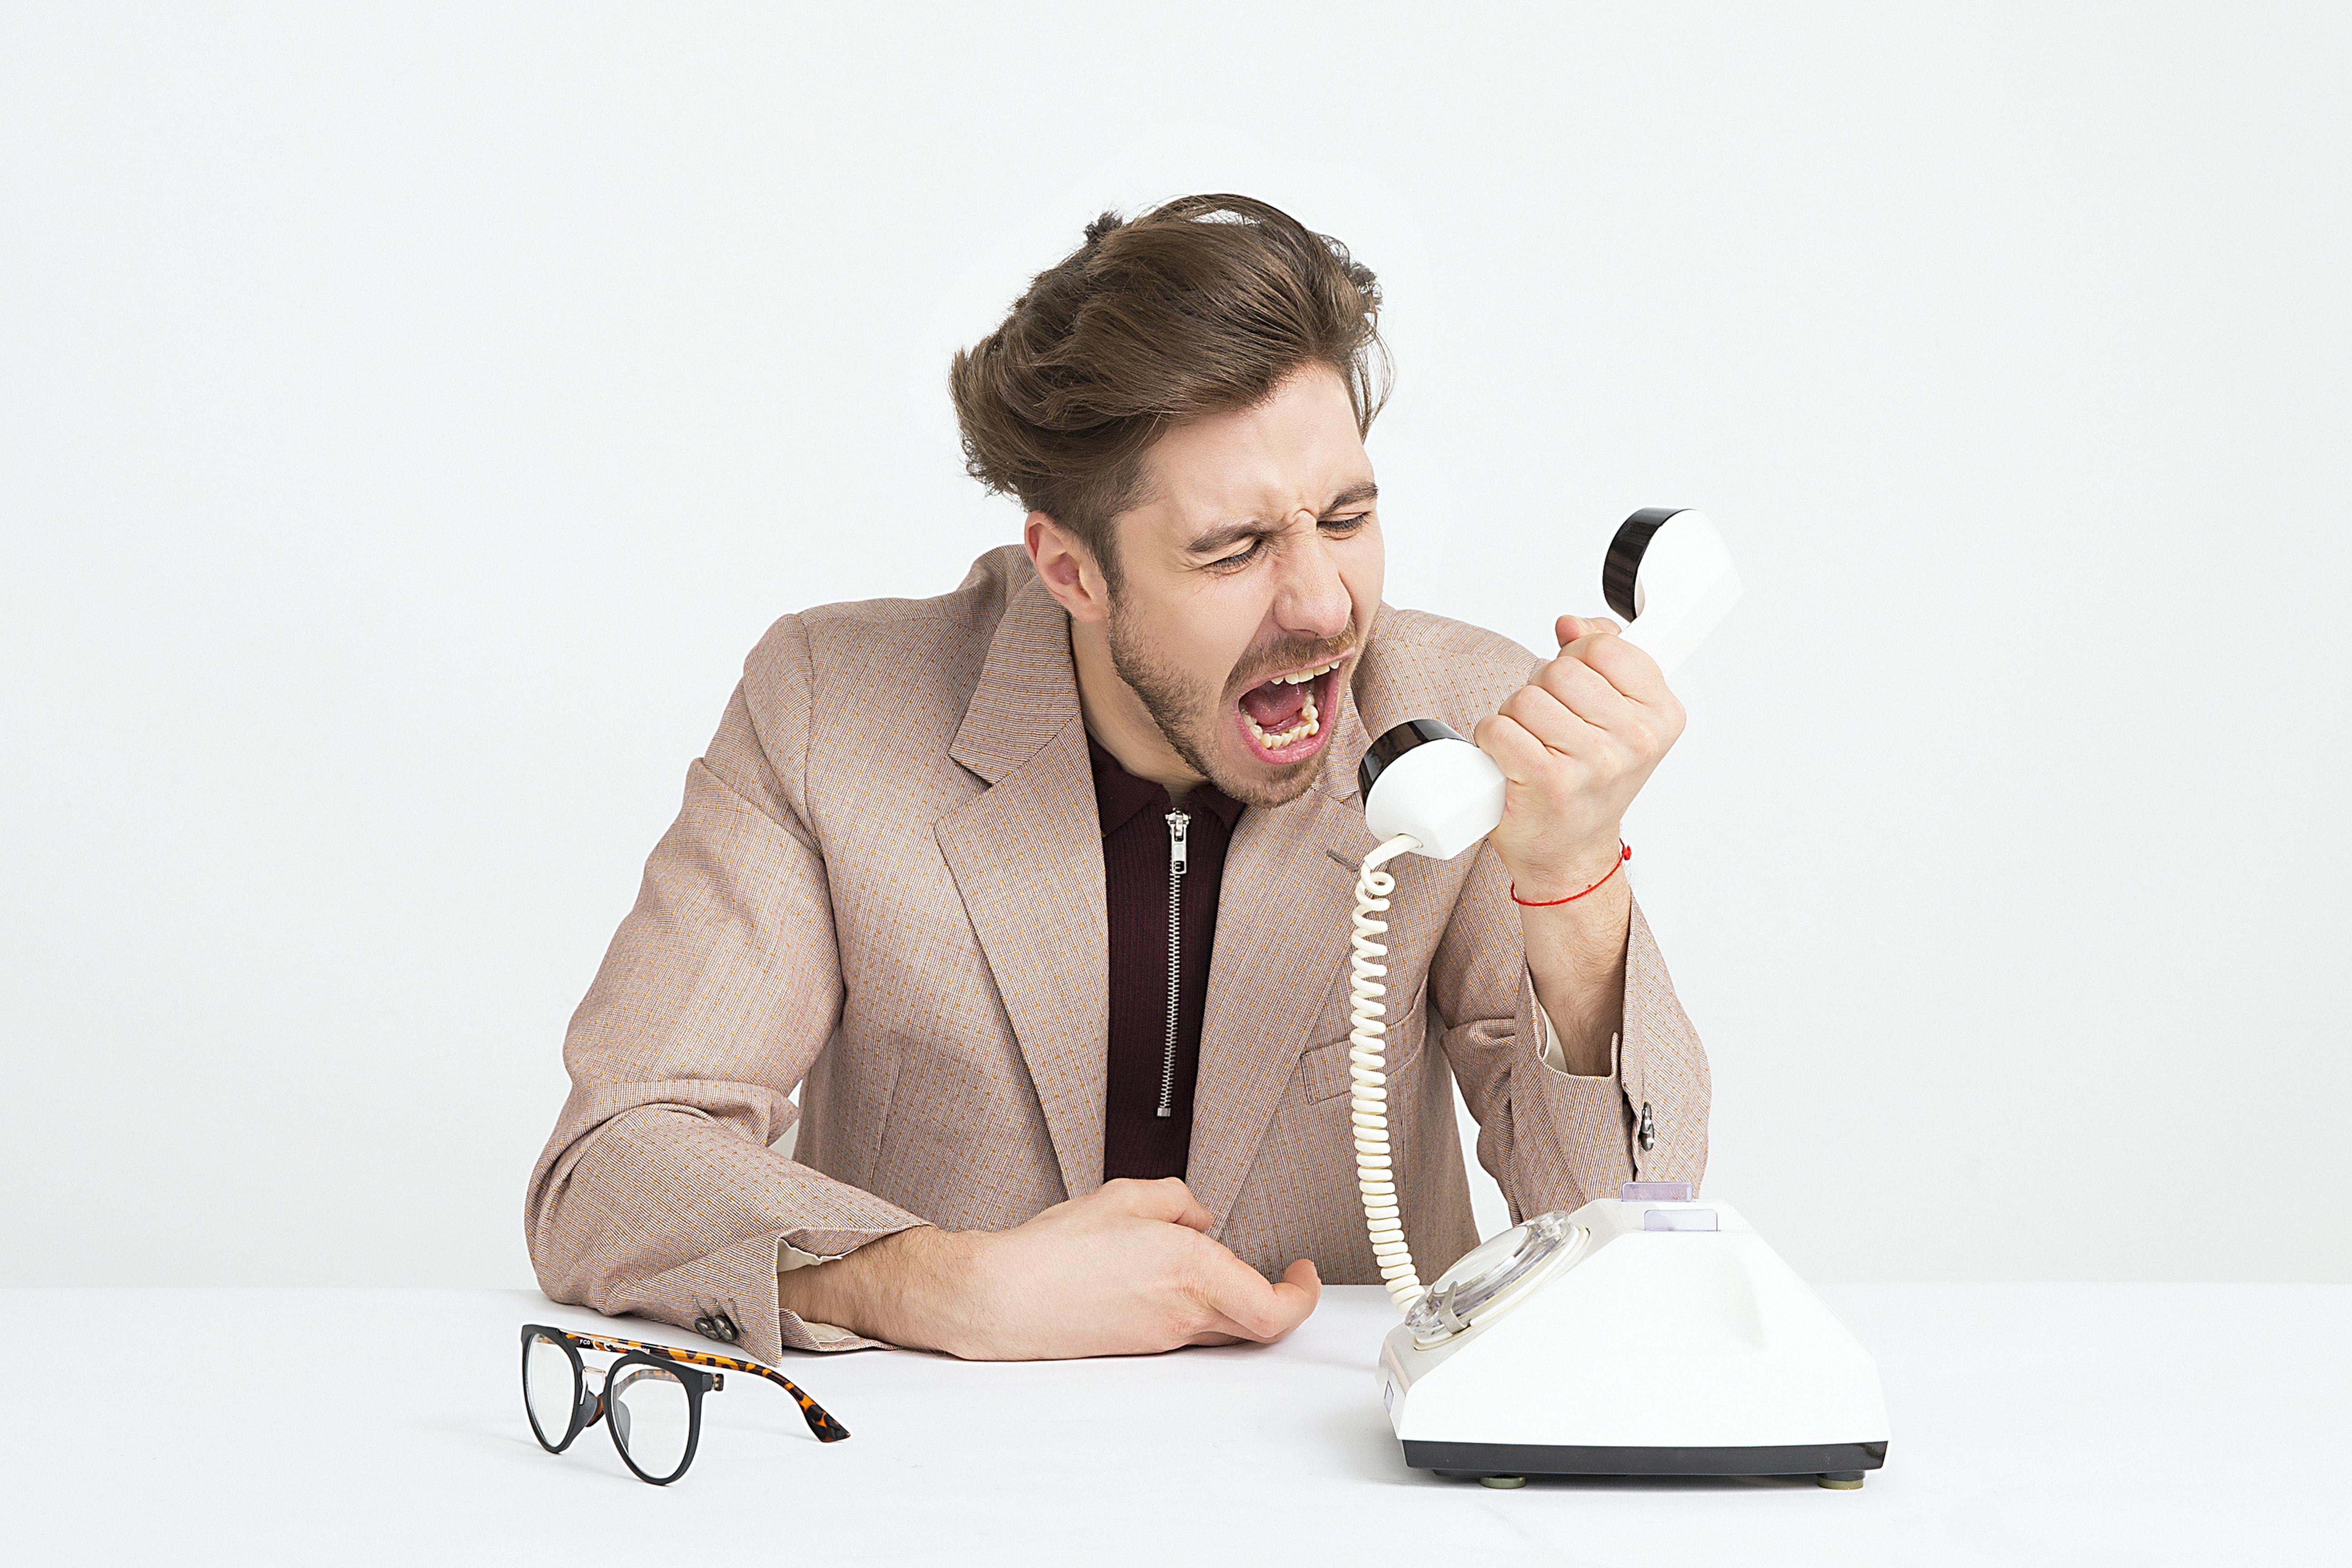 6 Traits of a Toxic Boss